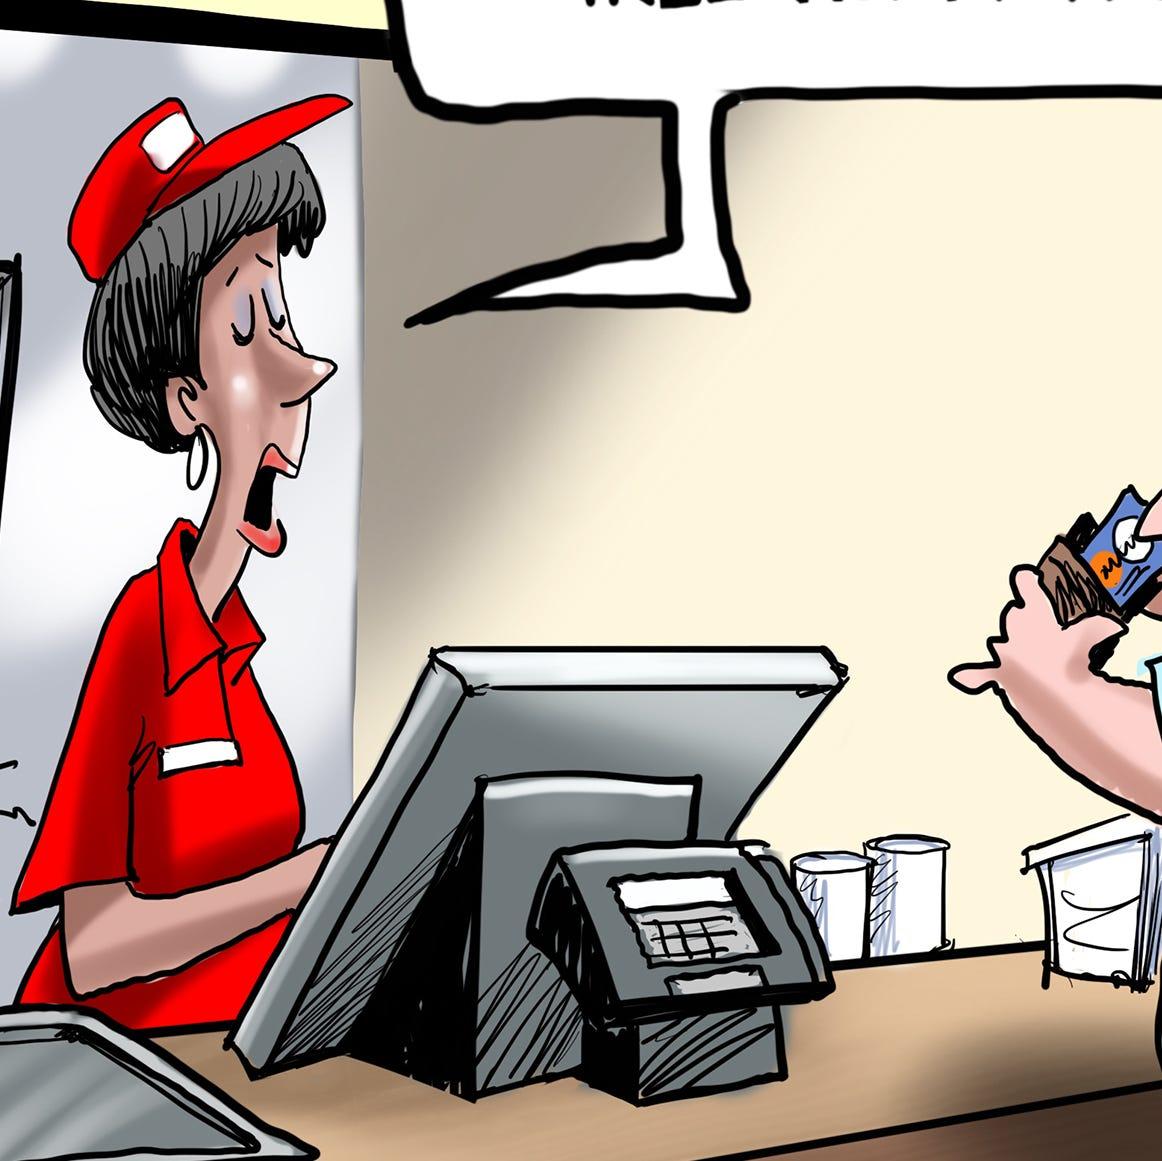 Cartoonist Gary Varvel: Plastic or paper straw problem